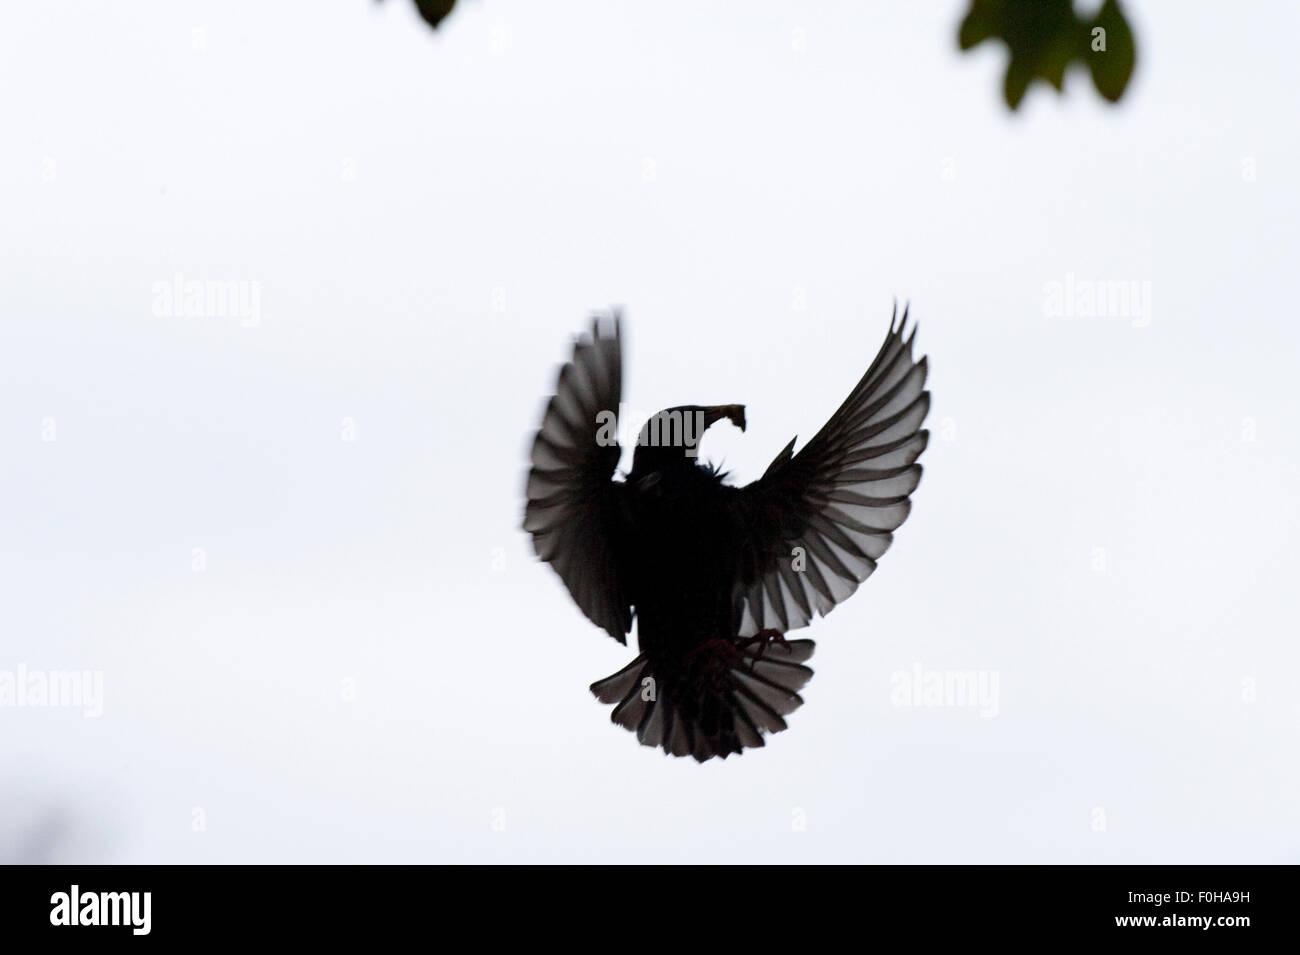 Common starling (Sturnus vulgaris) flying in garden of Vatican City, Rome, Italy, March 2010 - Stock Image